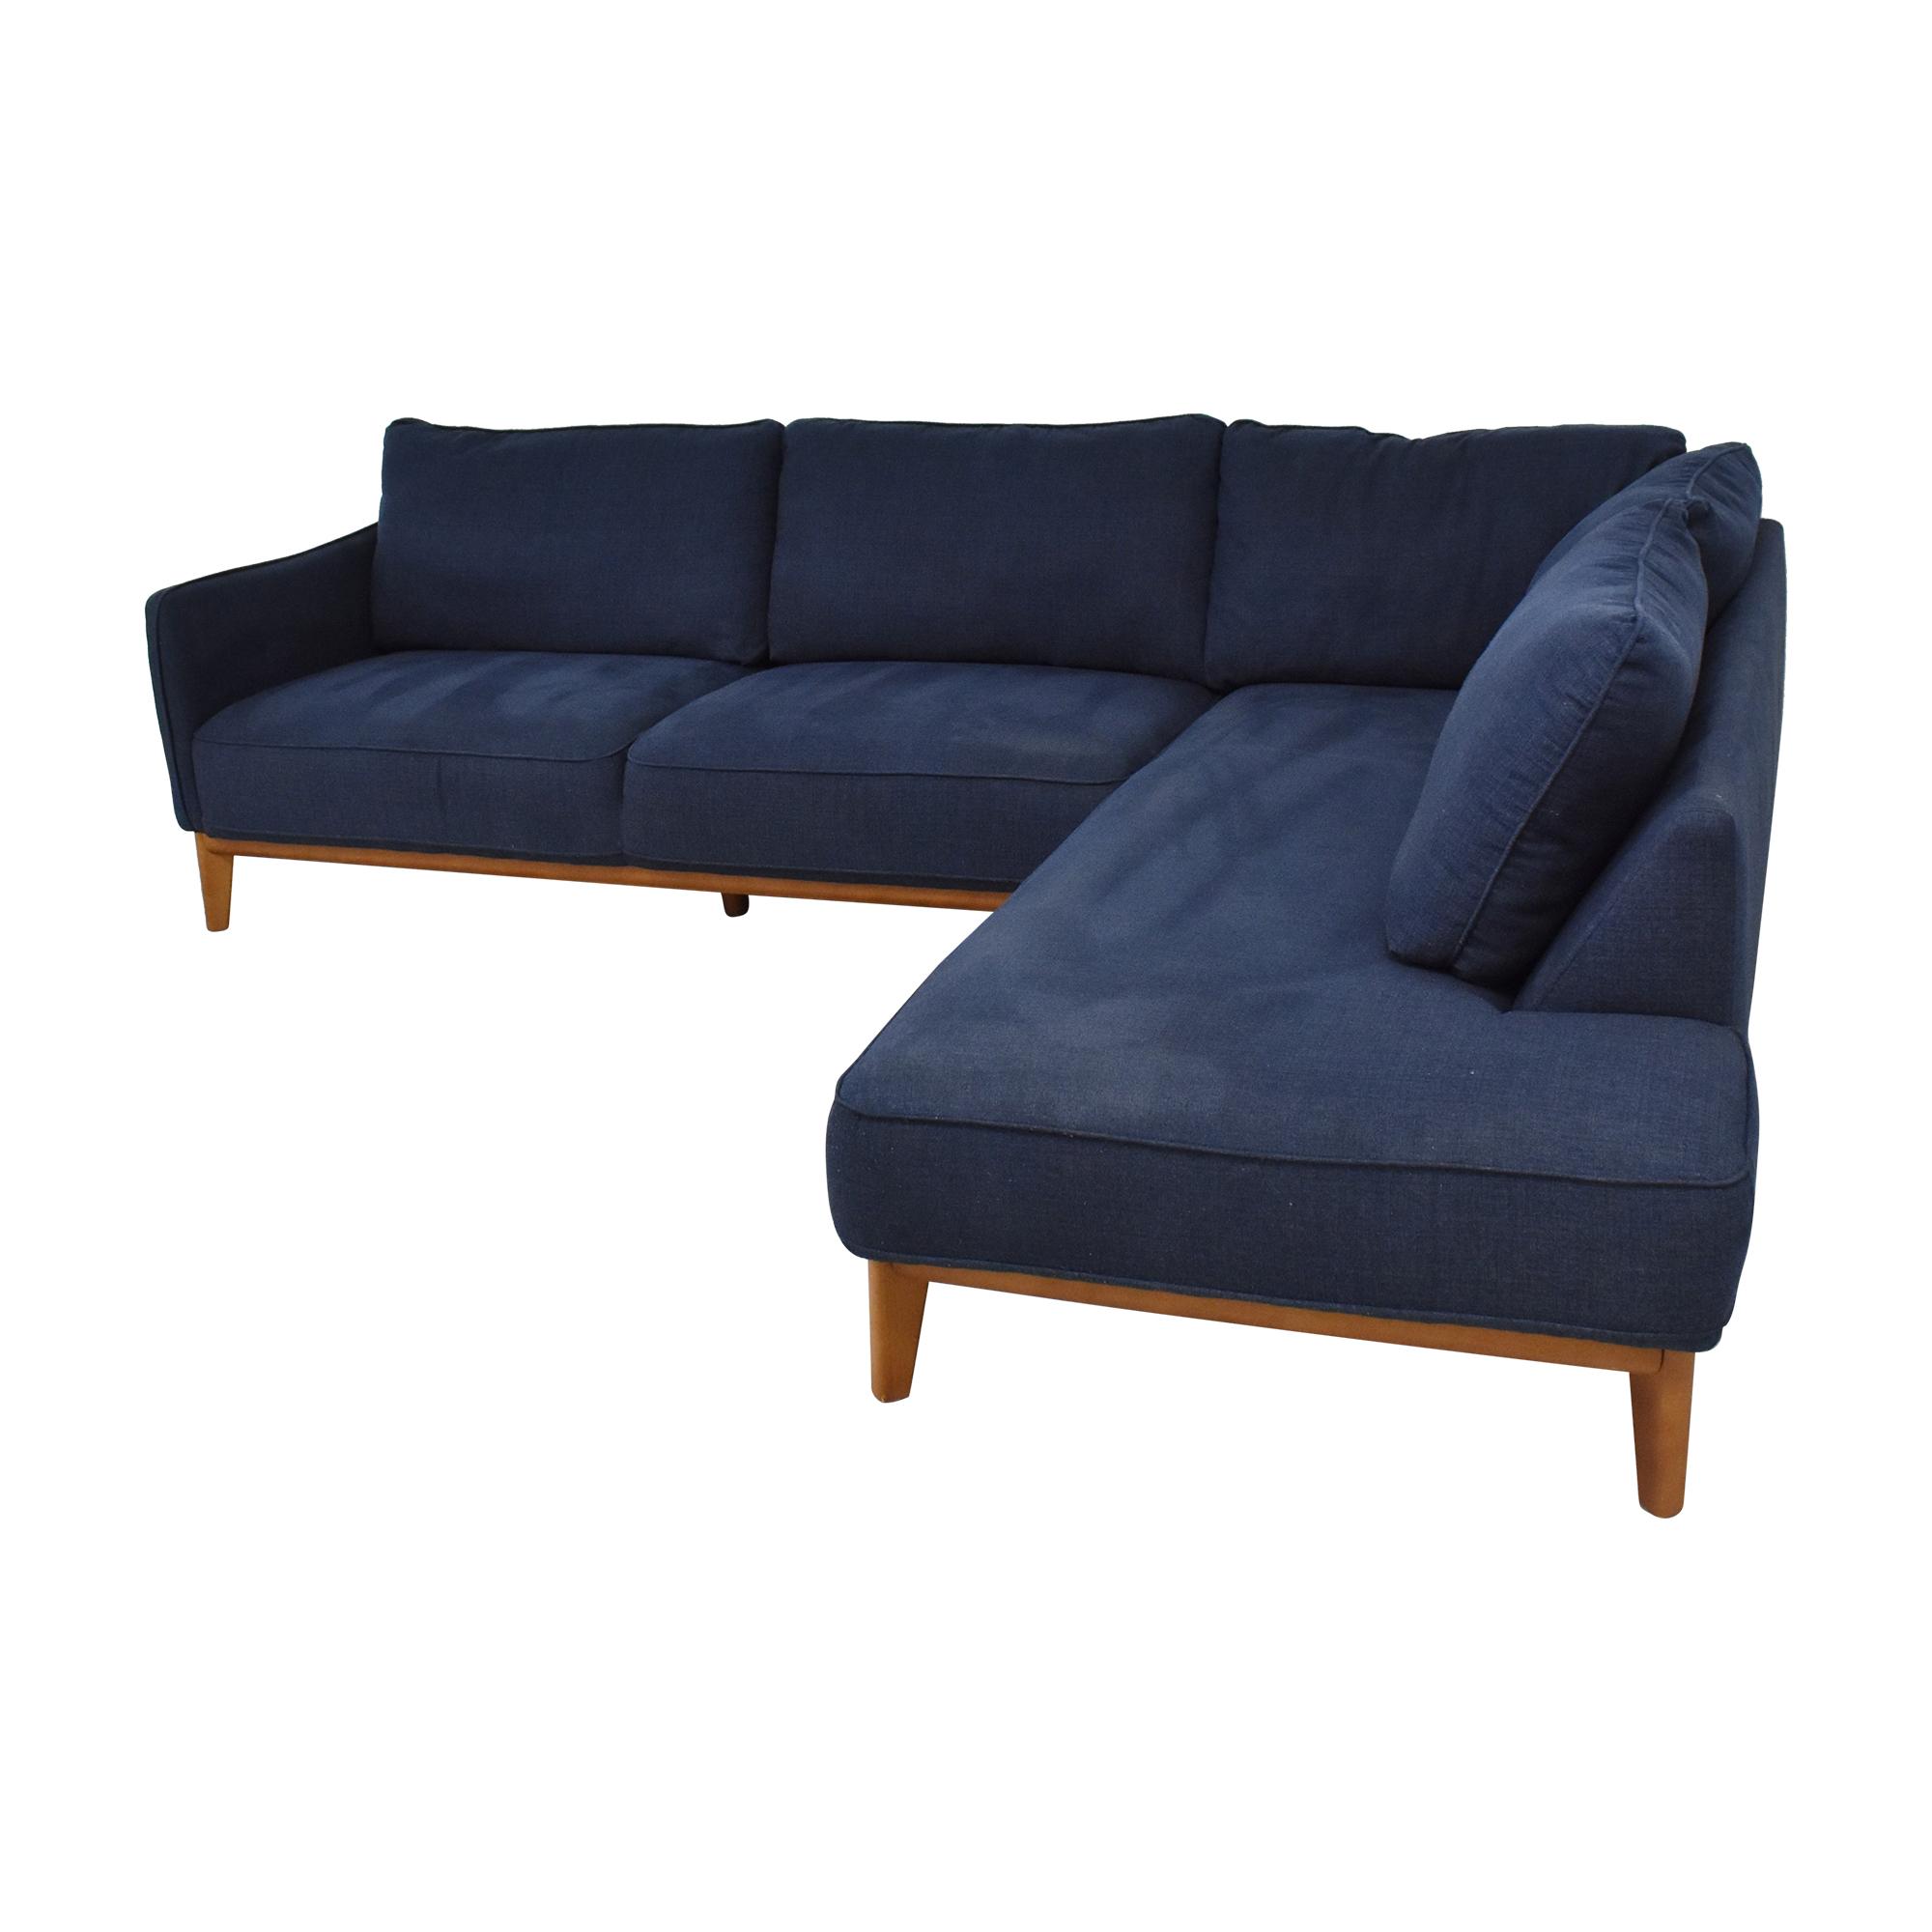 Jason Furniture Macy's Jollene Sectional Sofa second hand